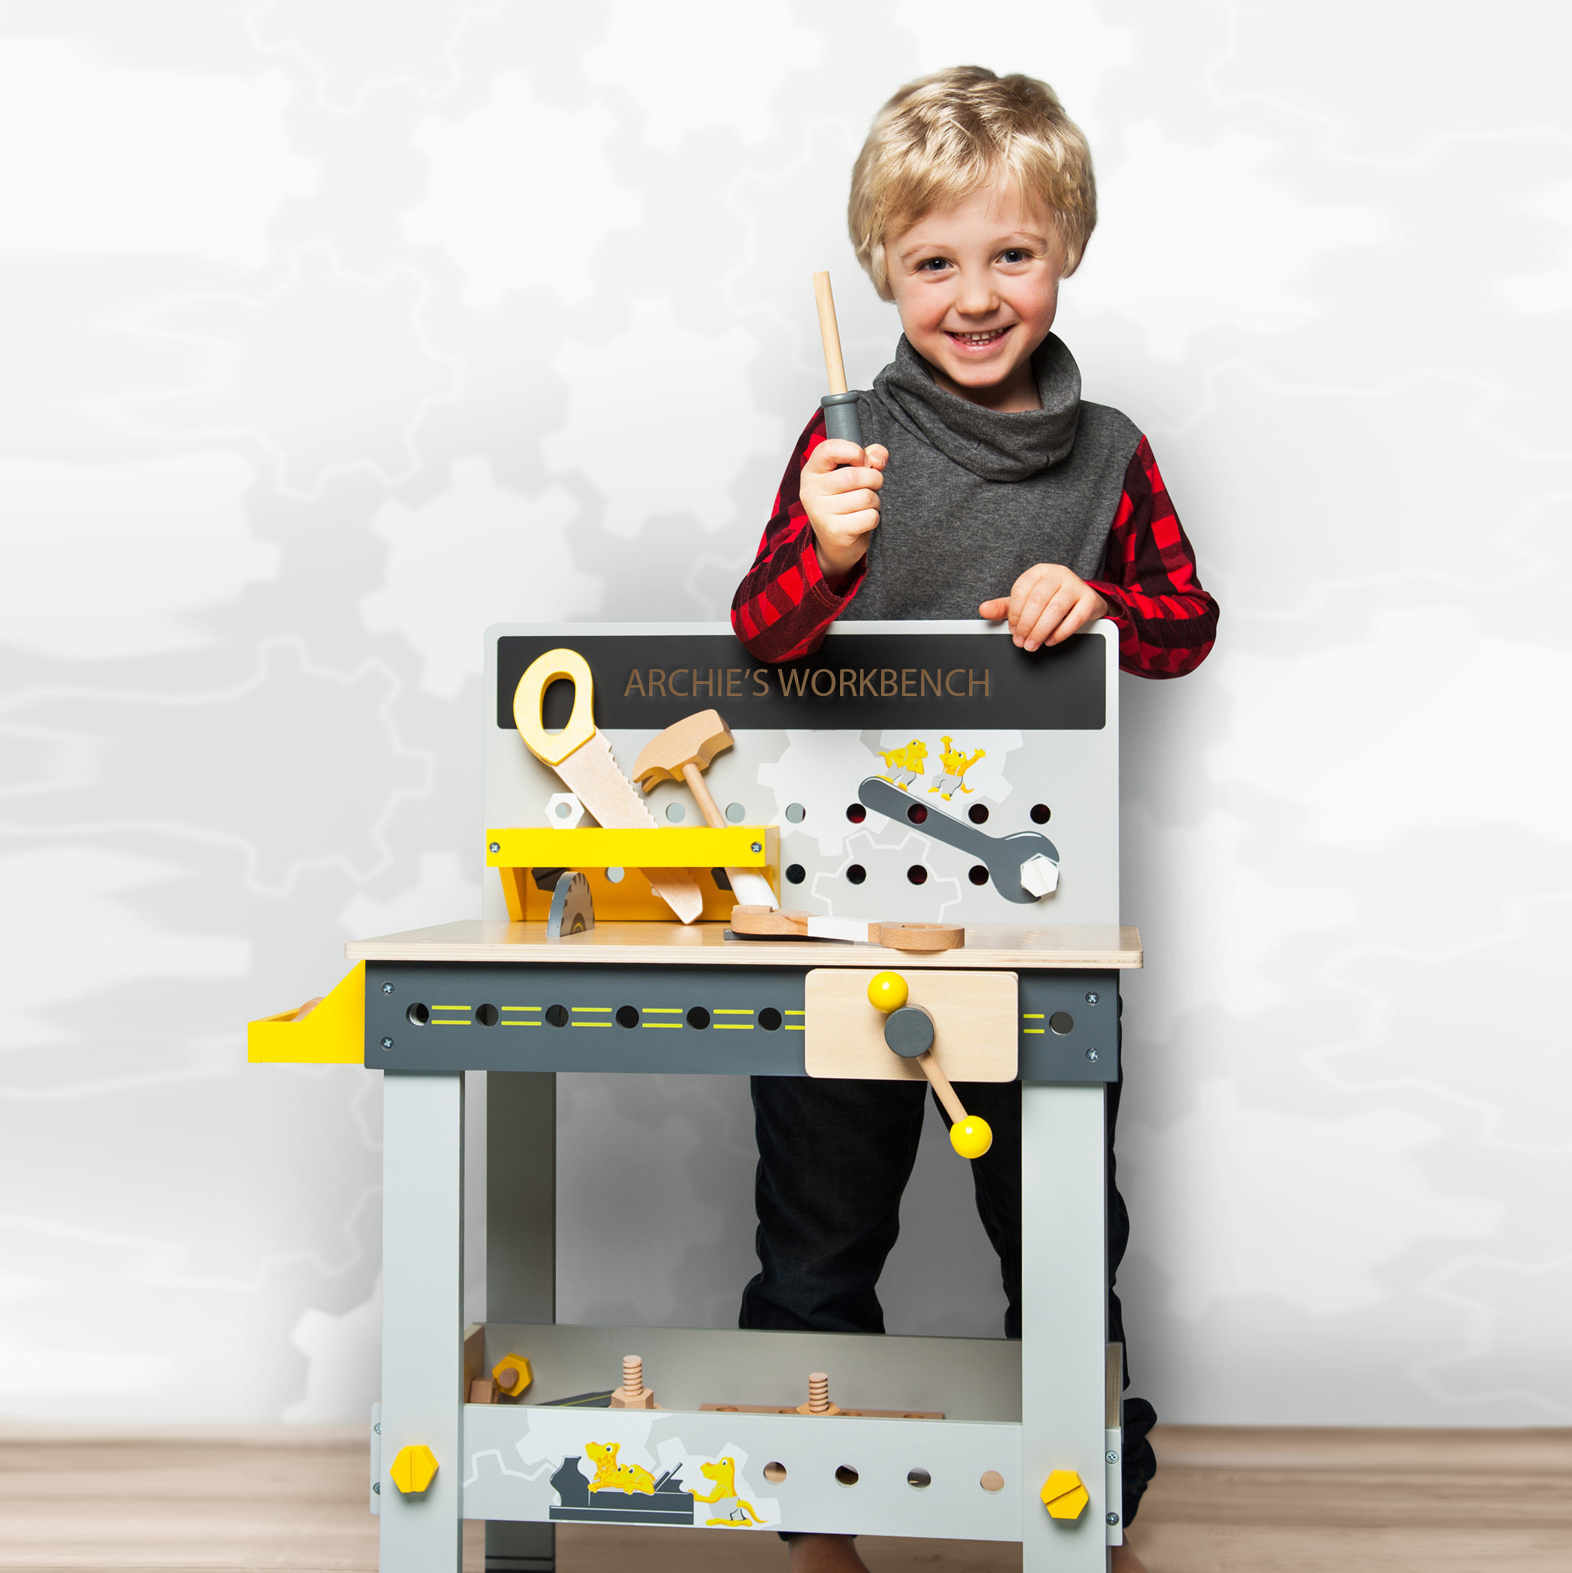 Personalised Kids Wooden Miniwob Toy Workbench